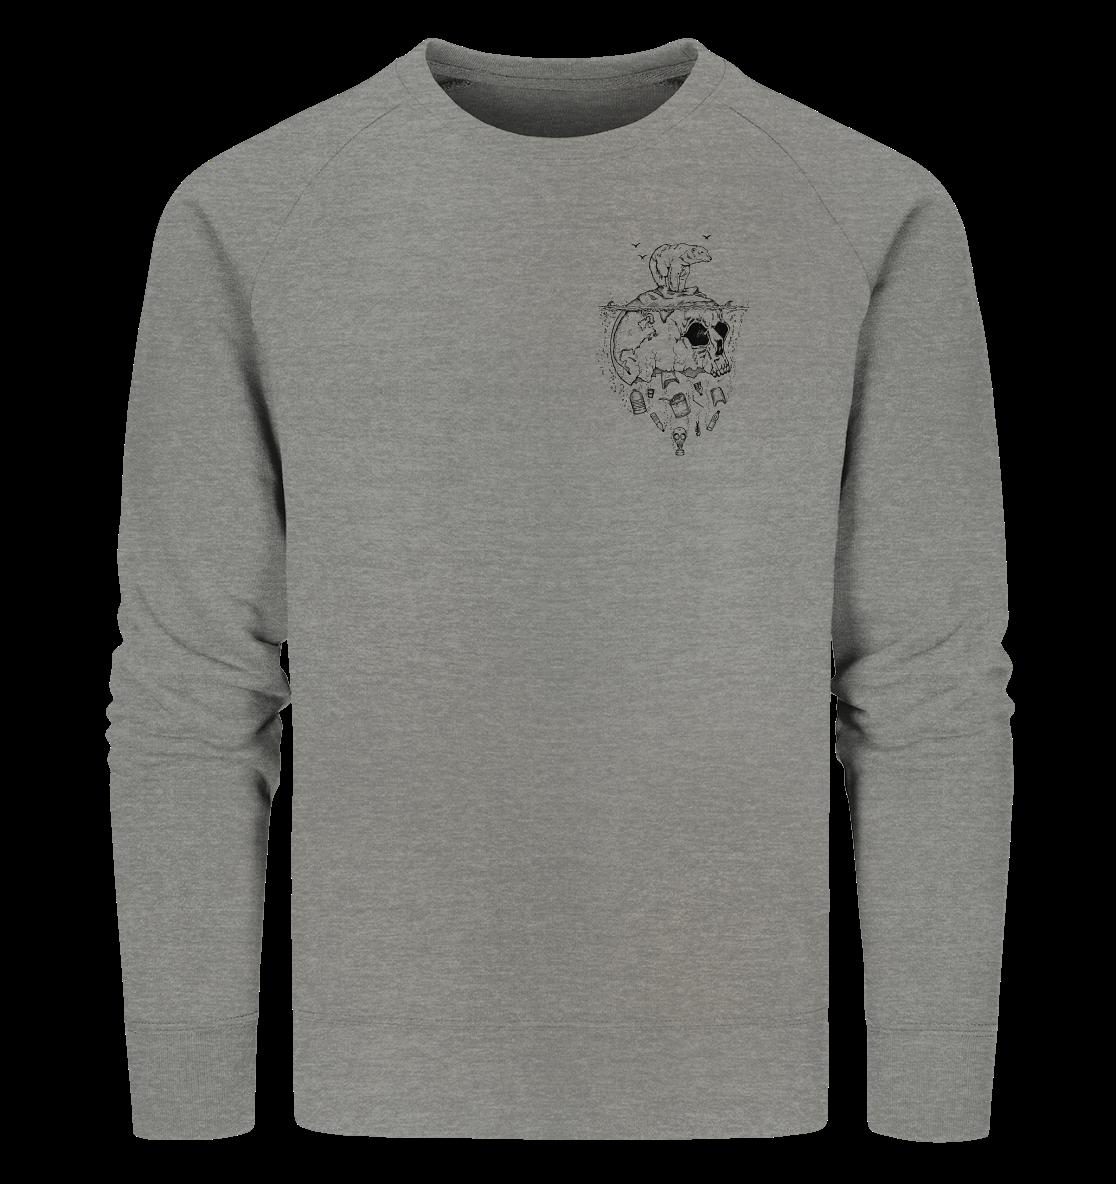 front-organic-sweatshirt-818381-1116x-16.png